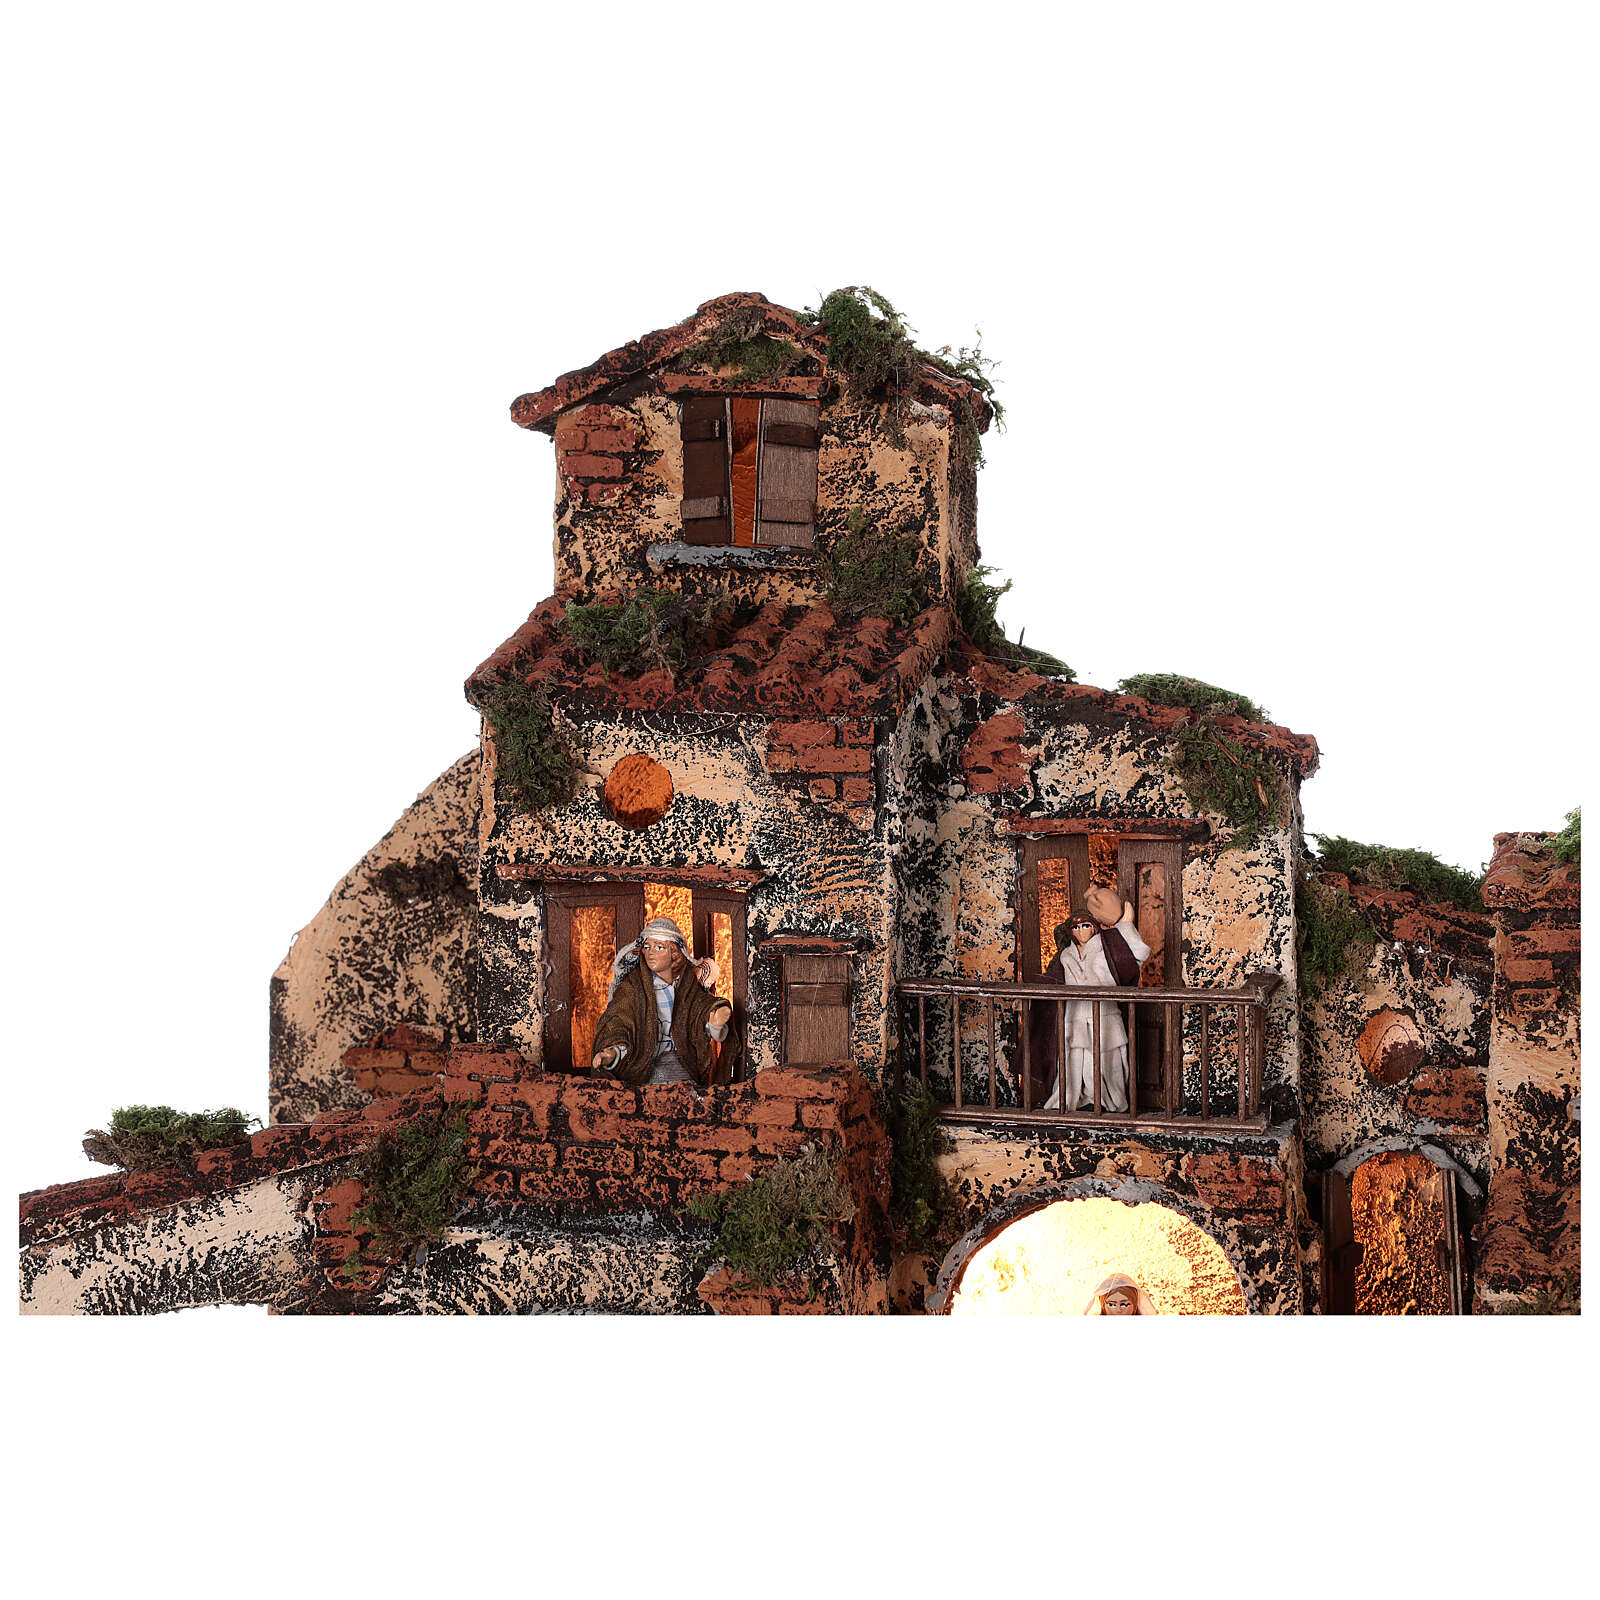 Complete Neapolitan Nativity Scene village fountain and lights 45x50x35 cm 4